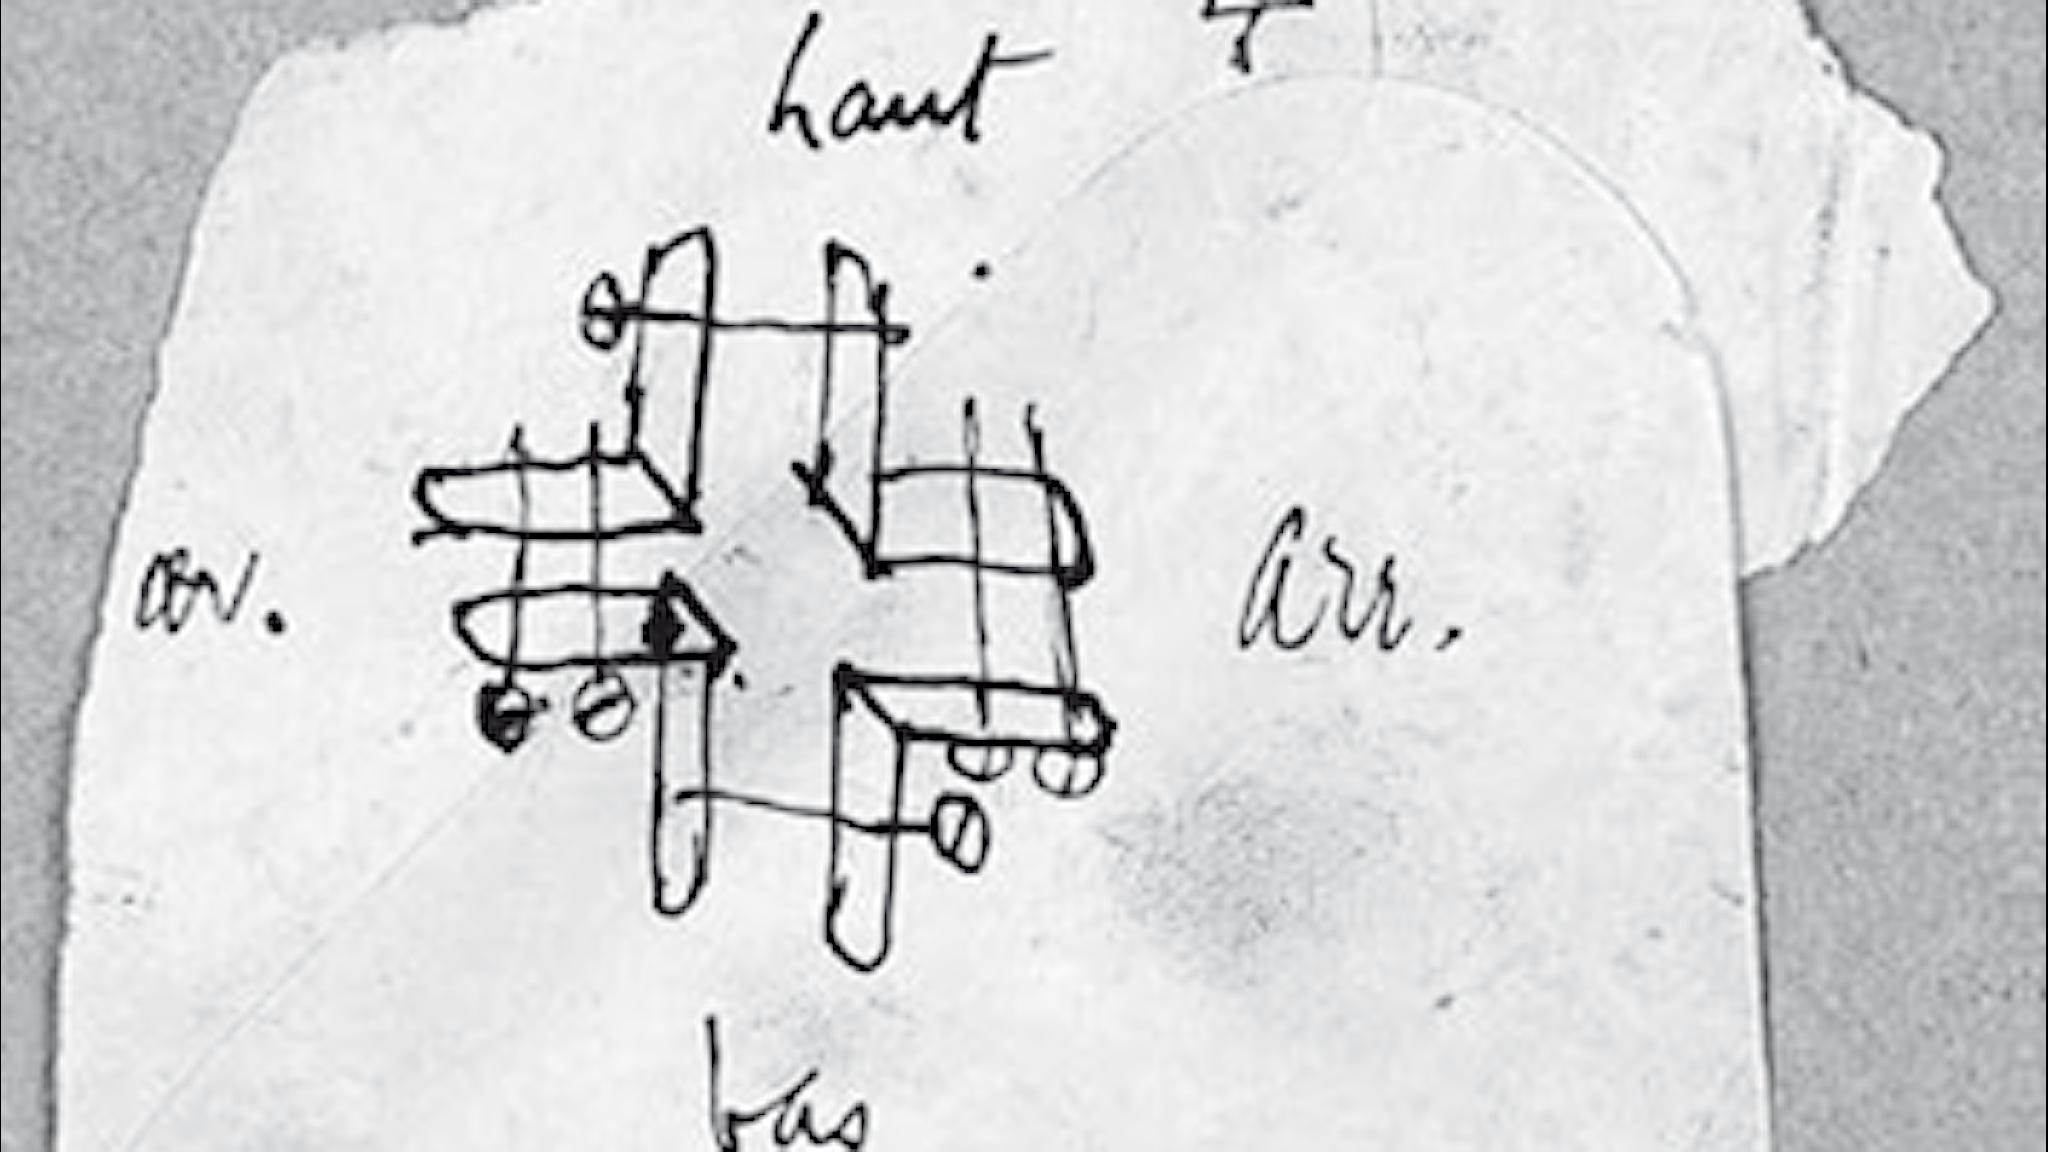 Verket signeras Marcel Duchamp